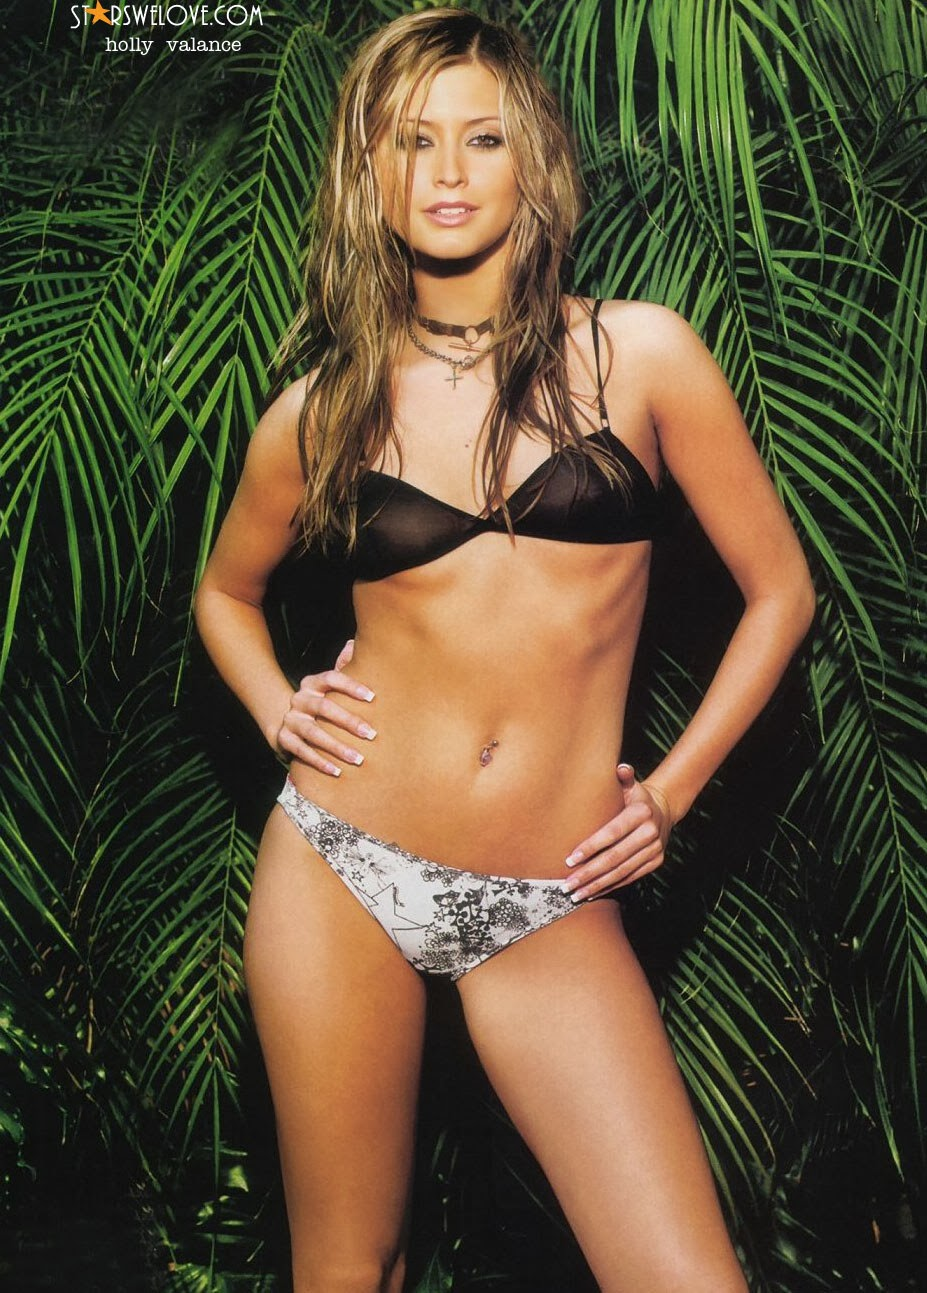 Holly valance bikini